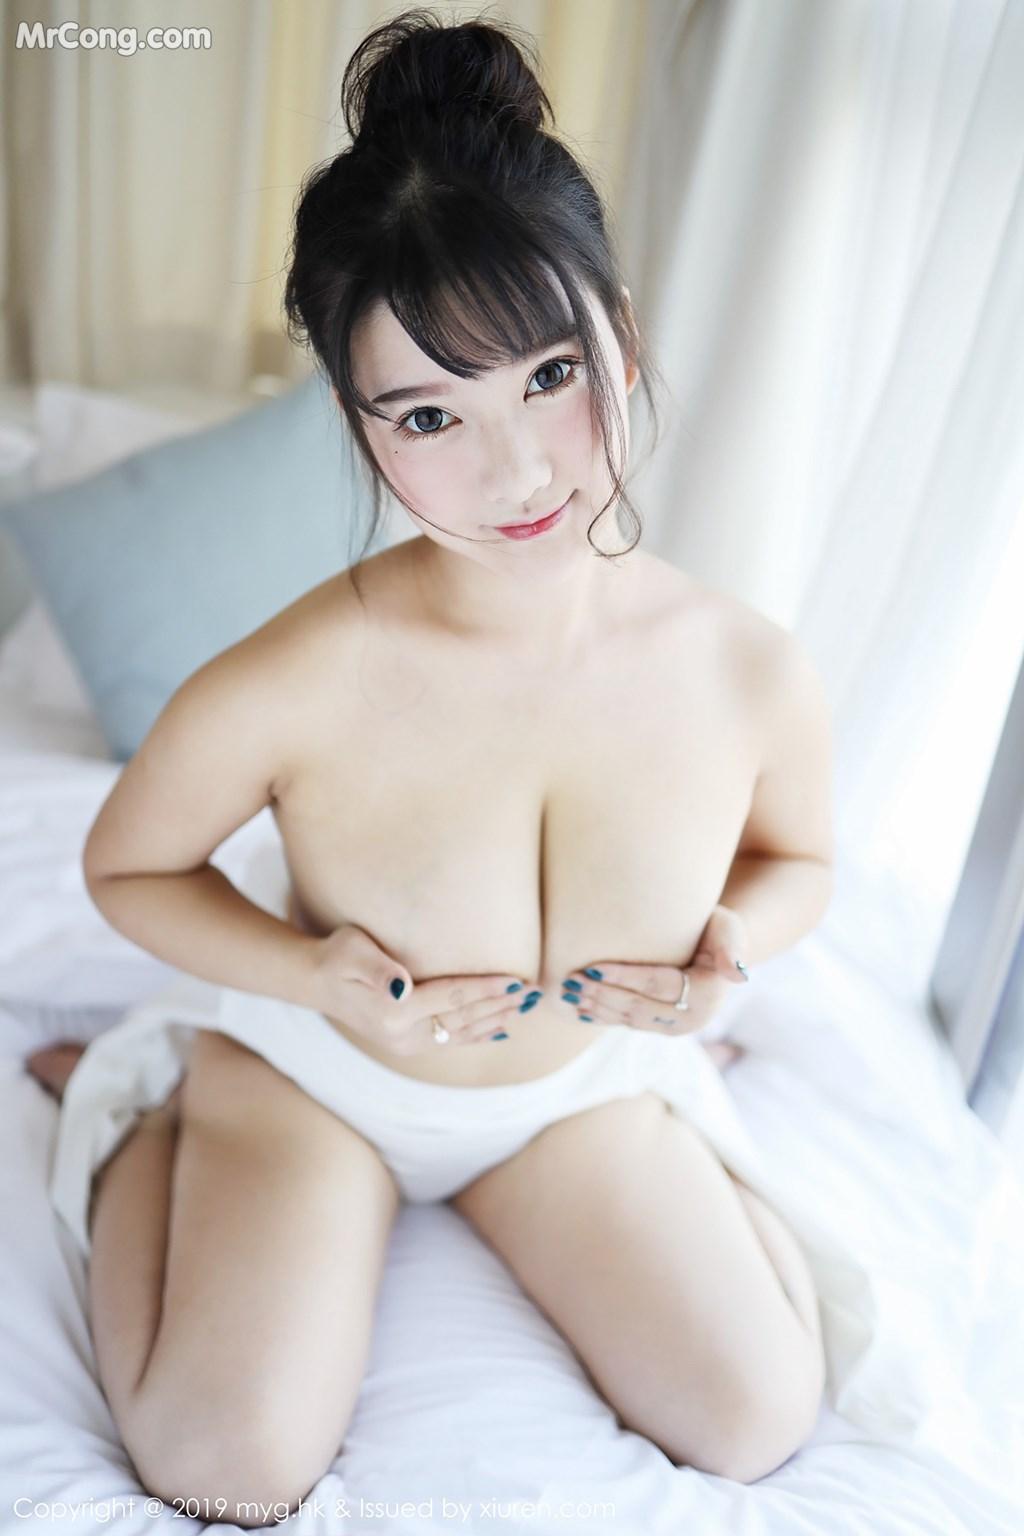 Image MyGirl-Vol.342-Xiao-You-Nai-MrCong.com-024 in post MyGirl Vol.342: Người mẫu Xiao You Nai (小尤奈) (41 ảnh)